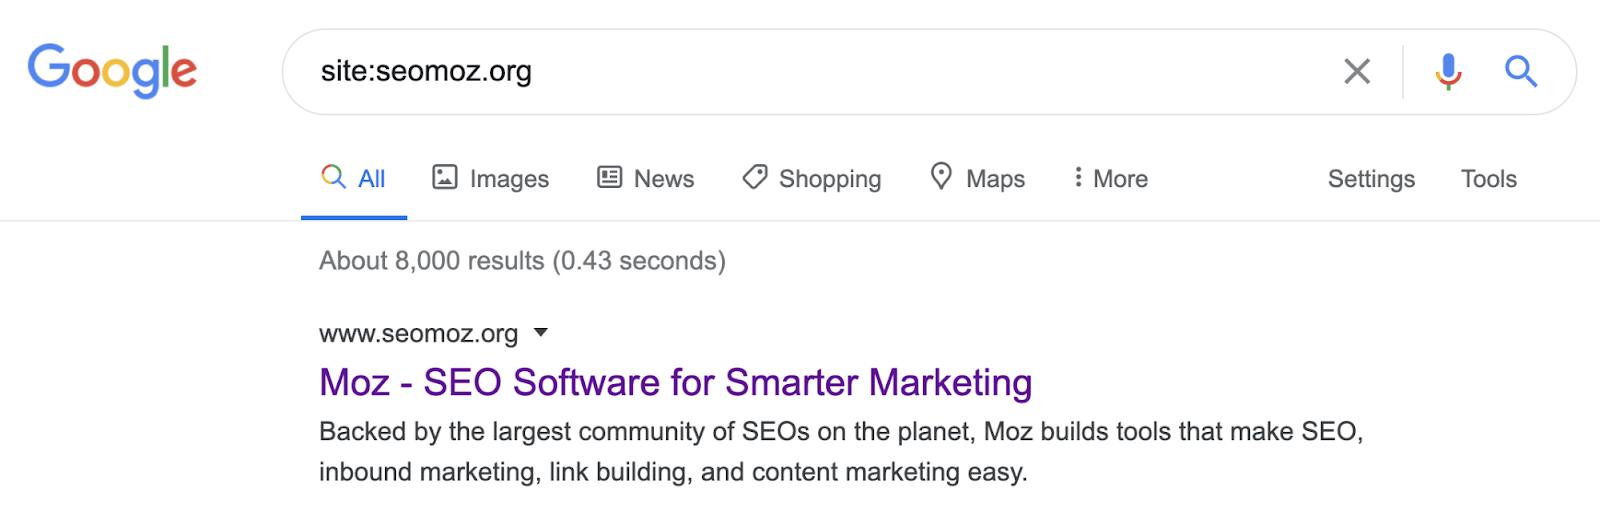 google搜索site命令